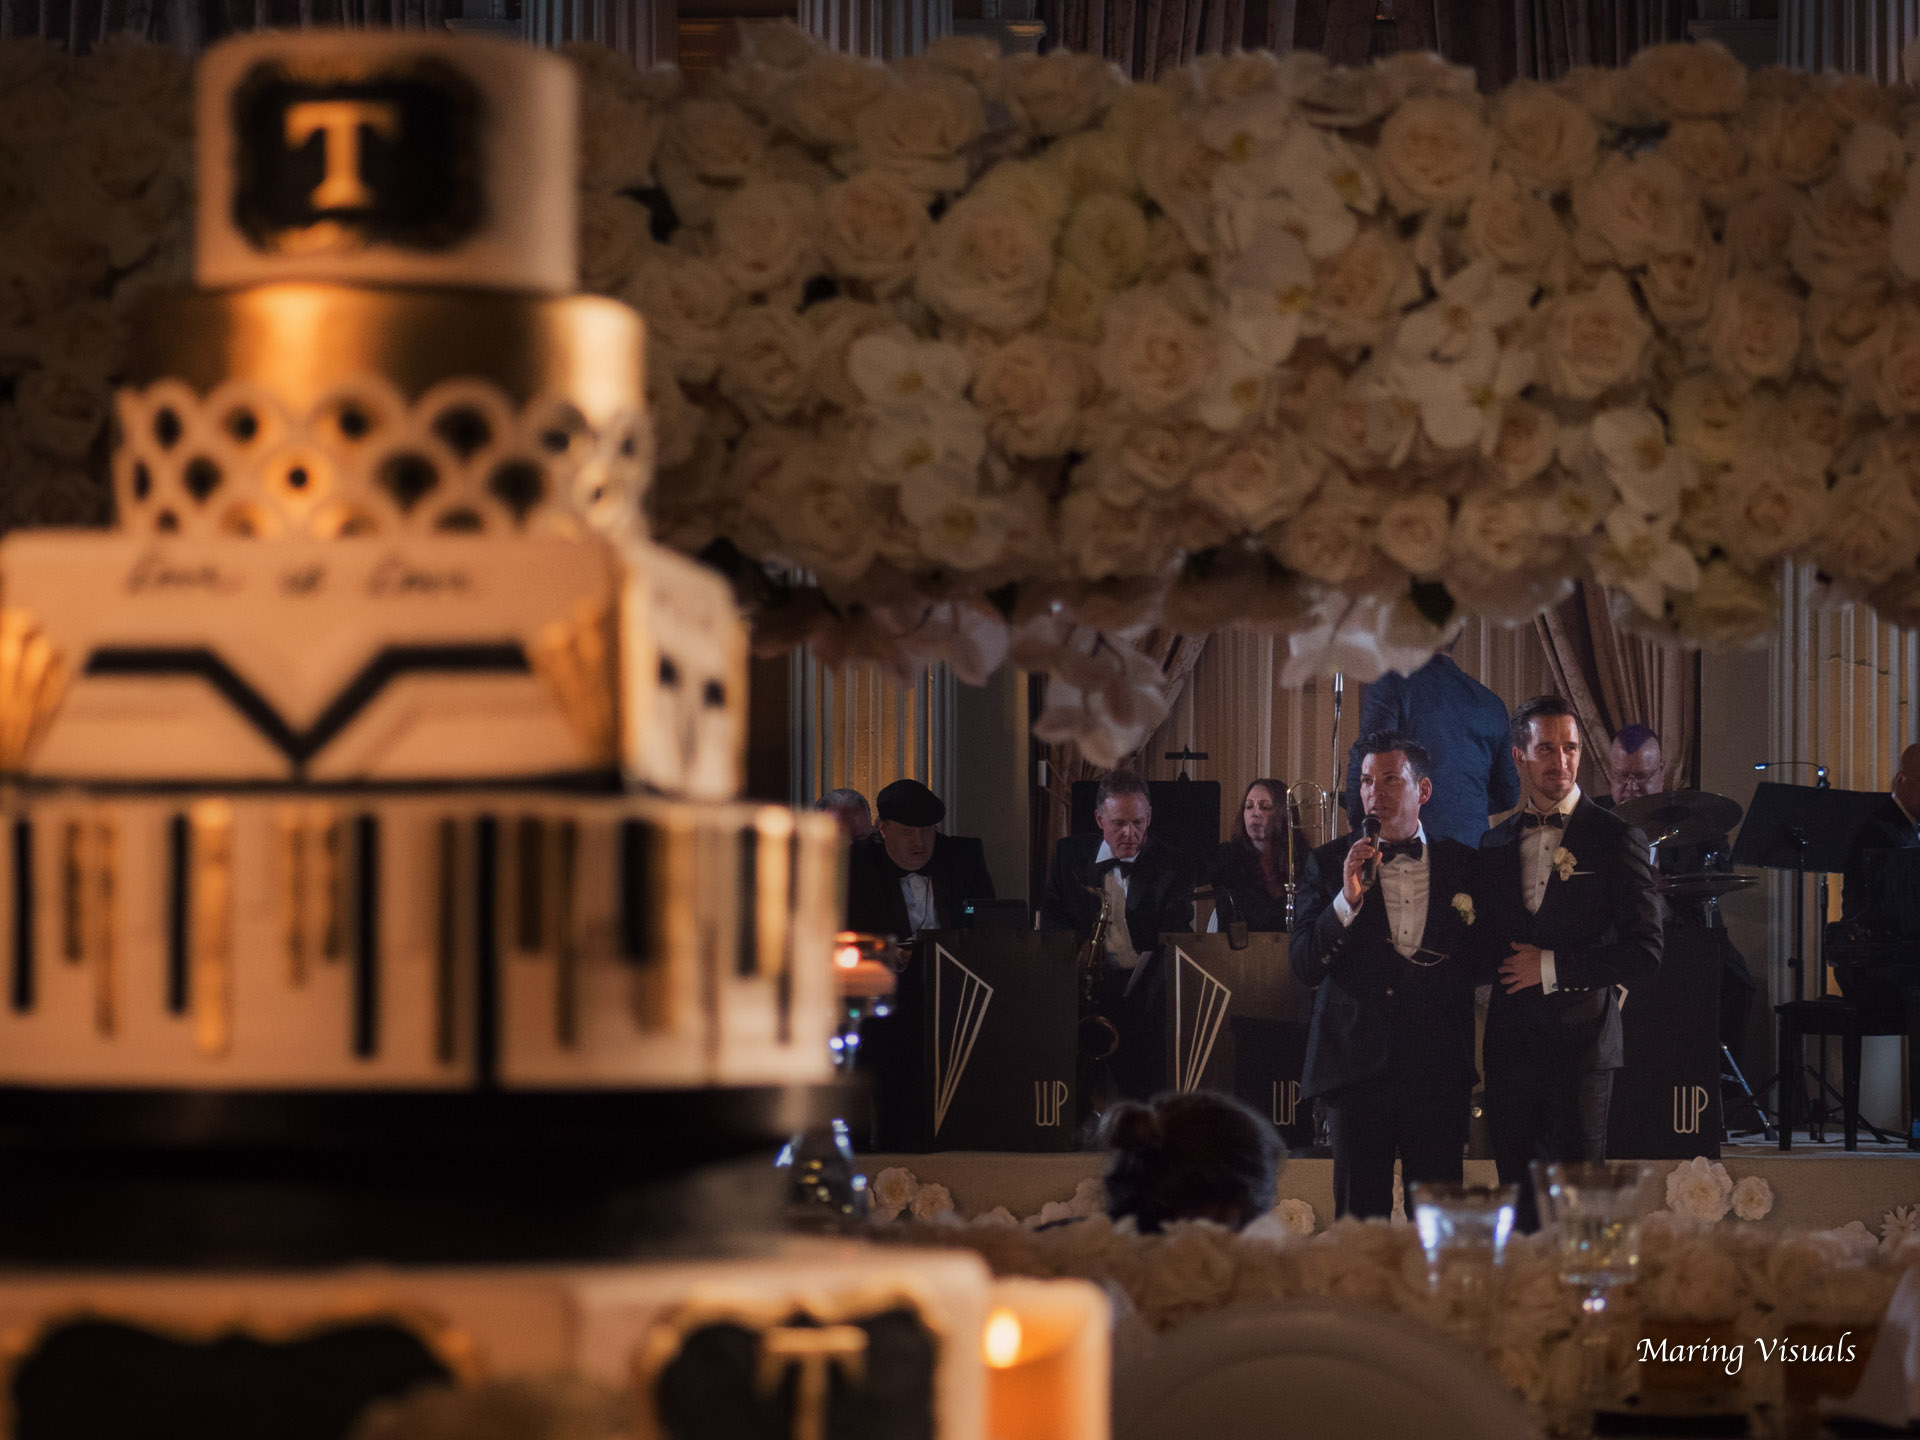 David Tutera Weddings by Maring Visuals 00564.jpg